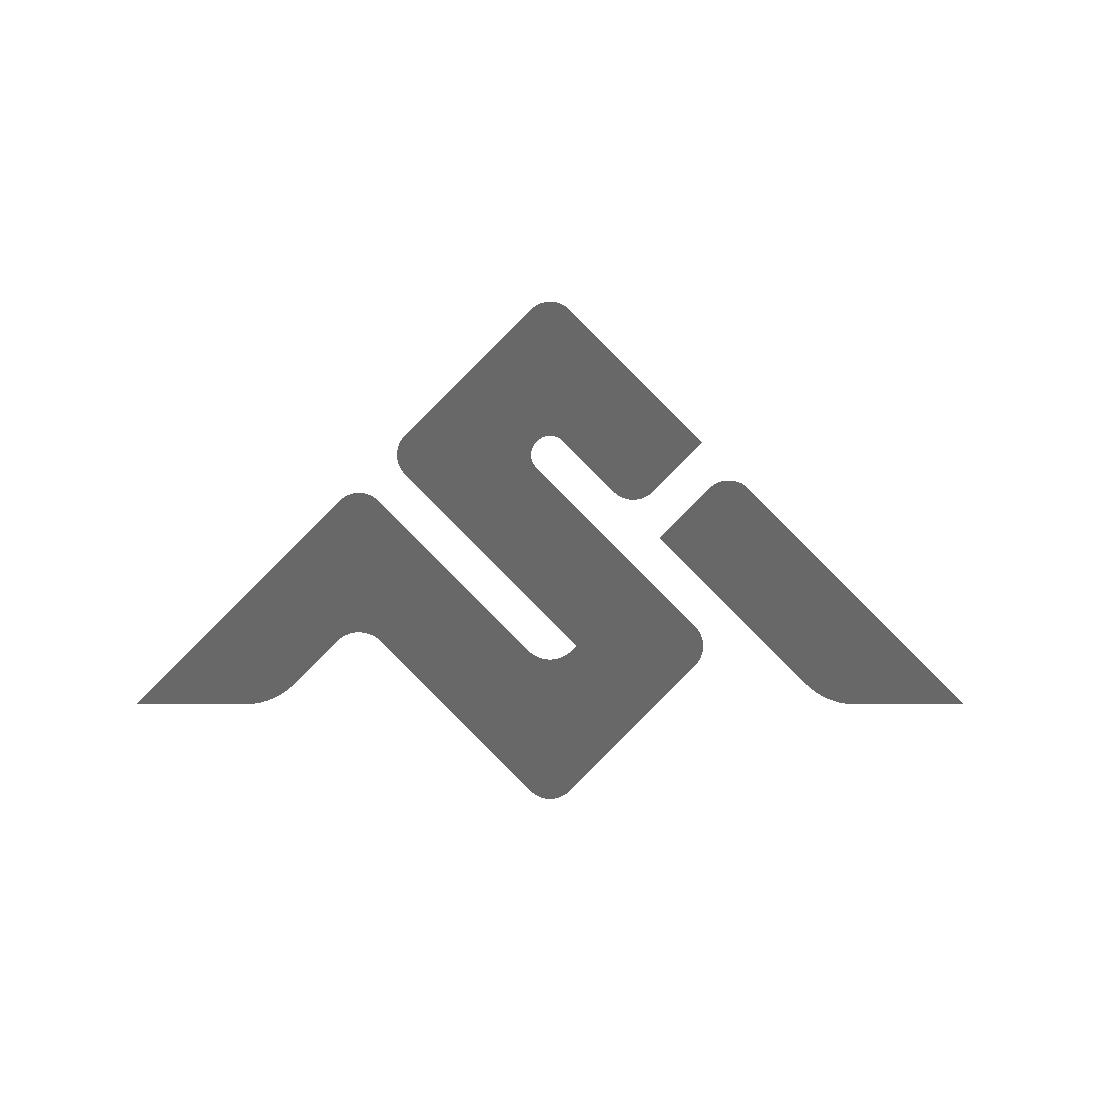 chaya life style roller skates pour femme achetez. Black Bedroom Furniture Sets. Home Design Ideas